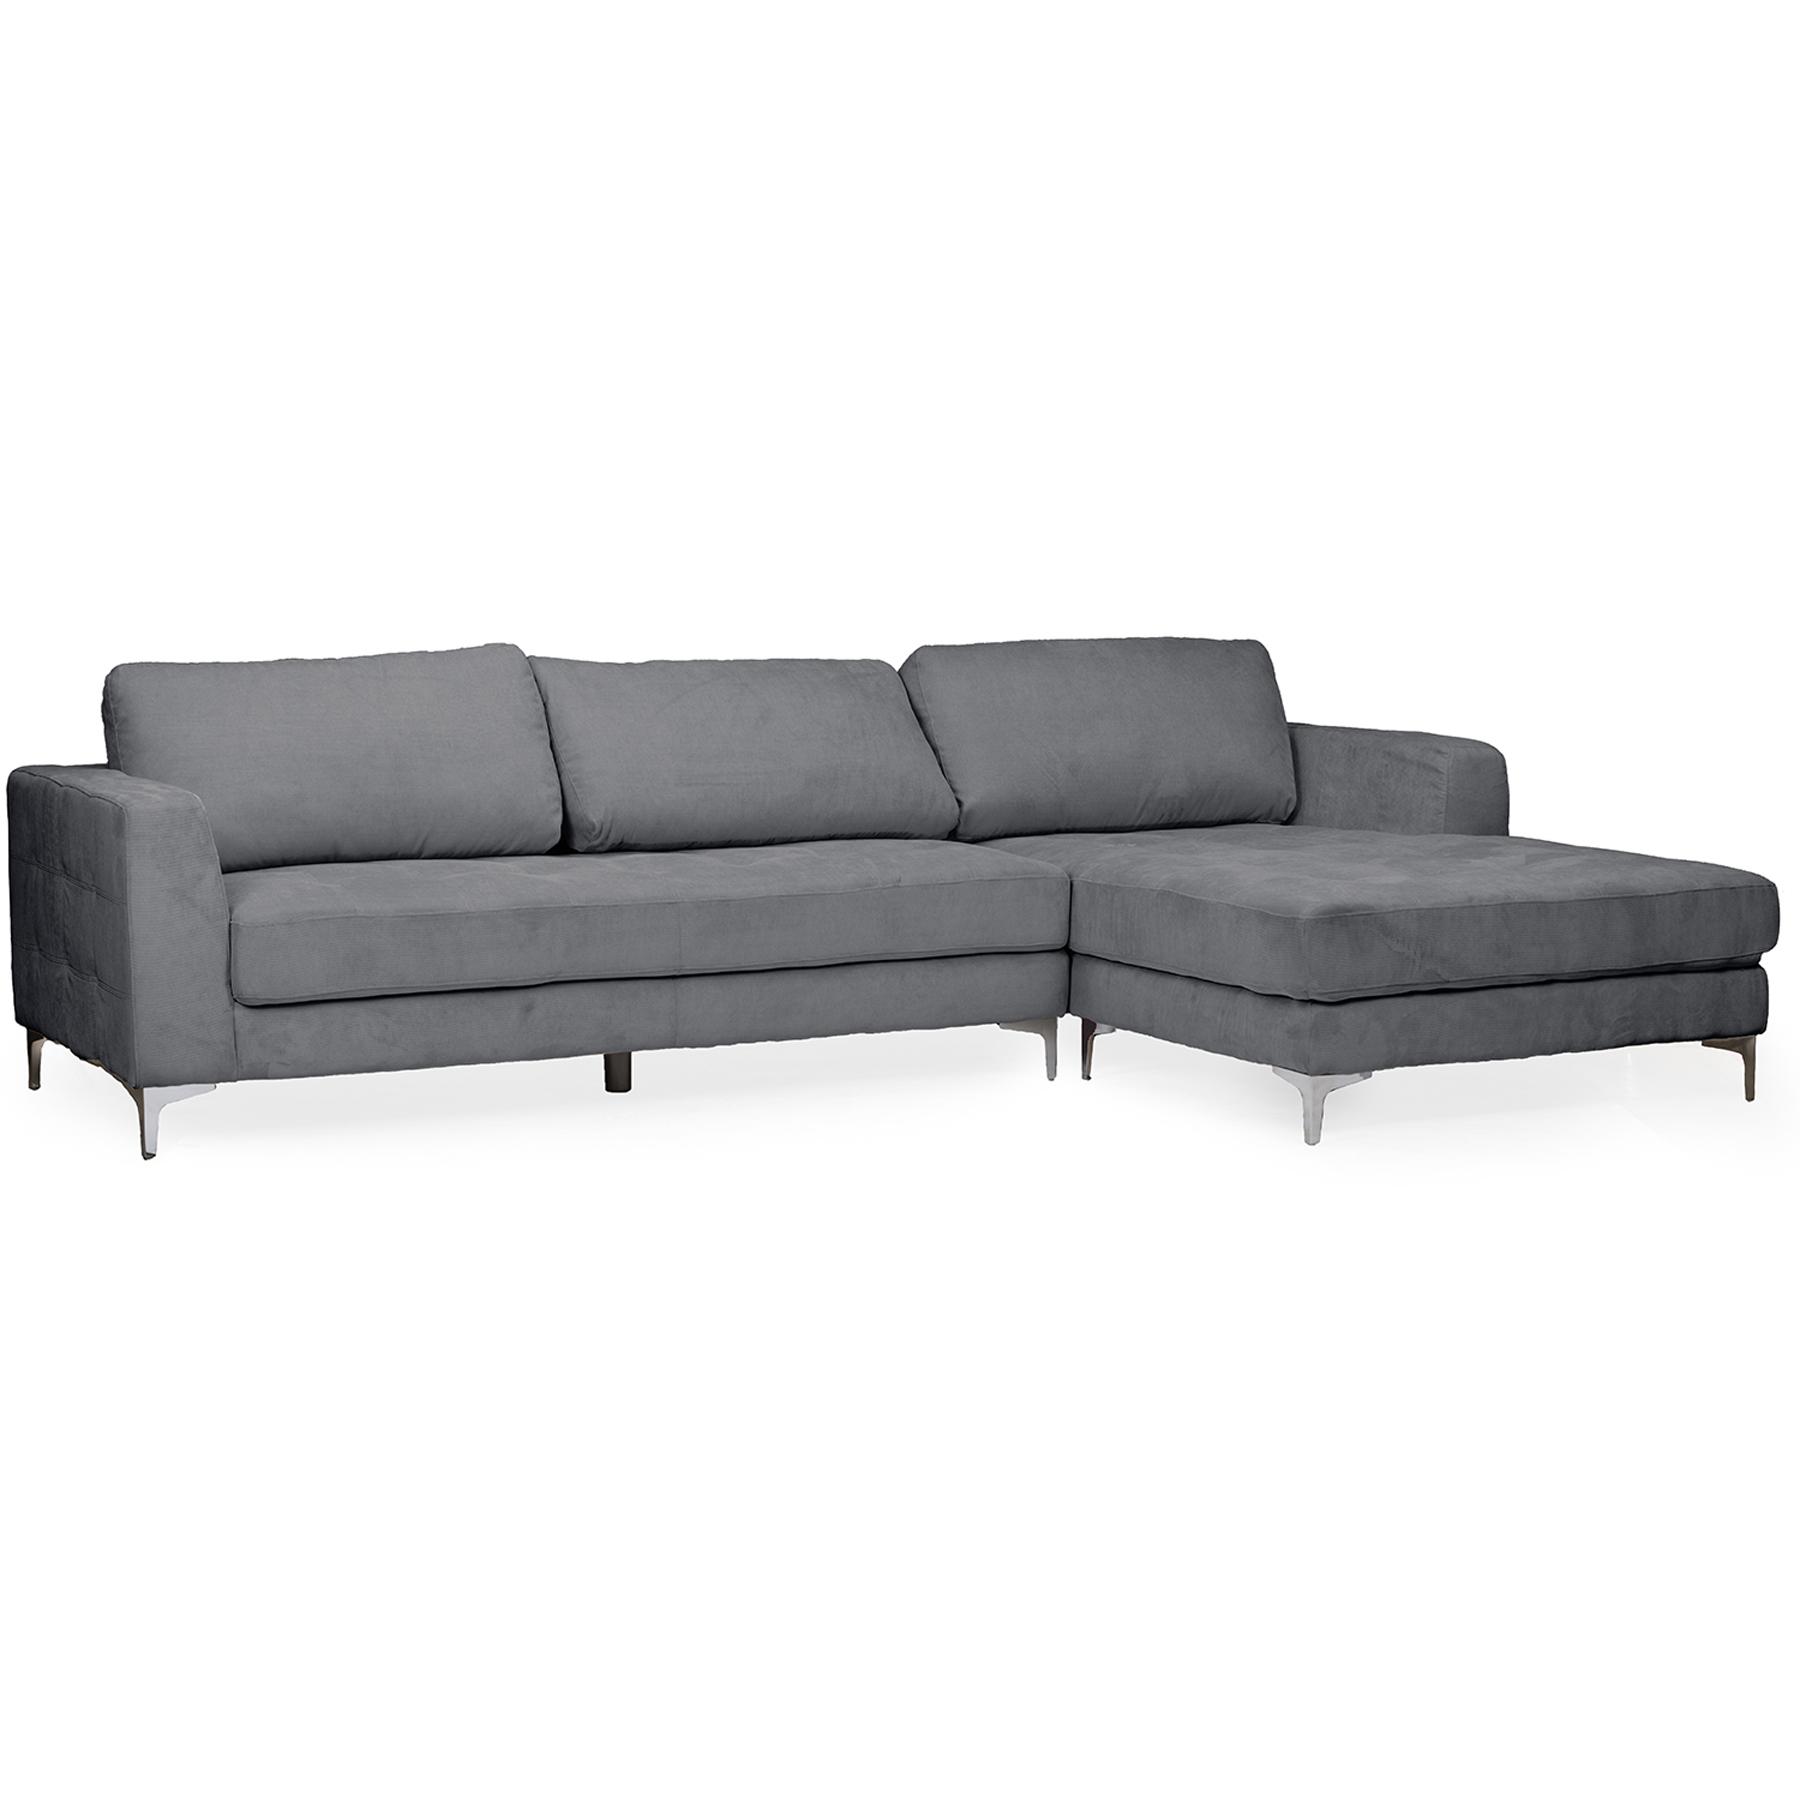 gray microfiber sectional sofas habitat sleigh sofa baxton studio agnew contemporary grey right